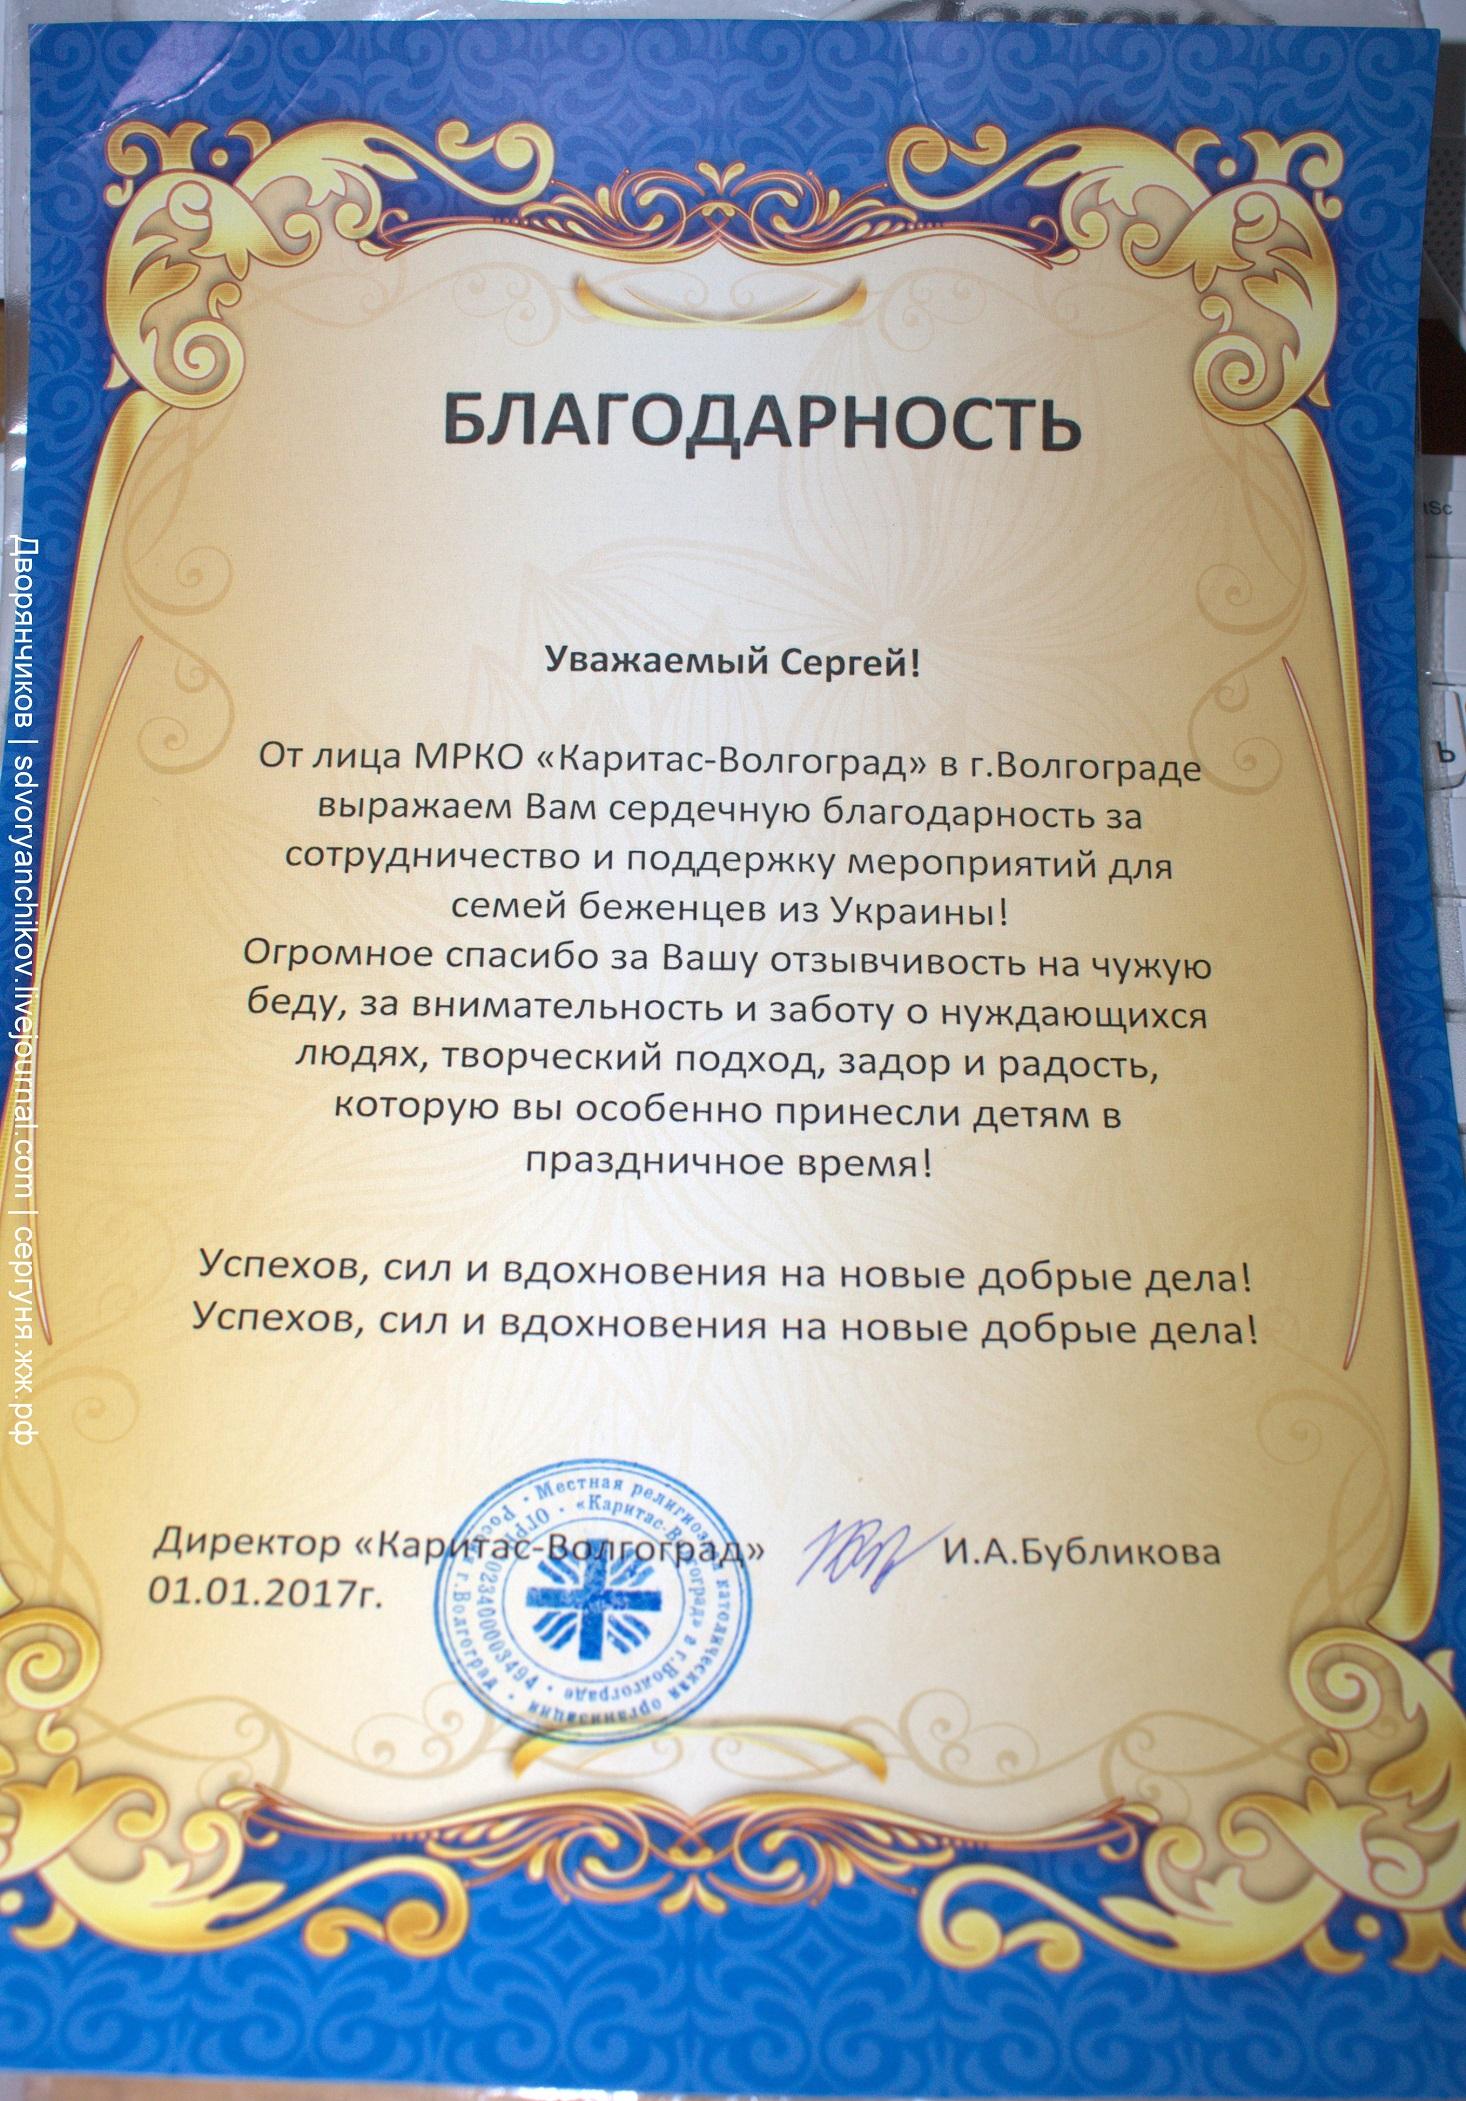 Благодарность от Каритас-Волгоград